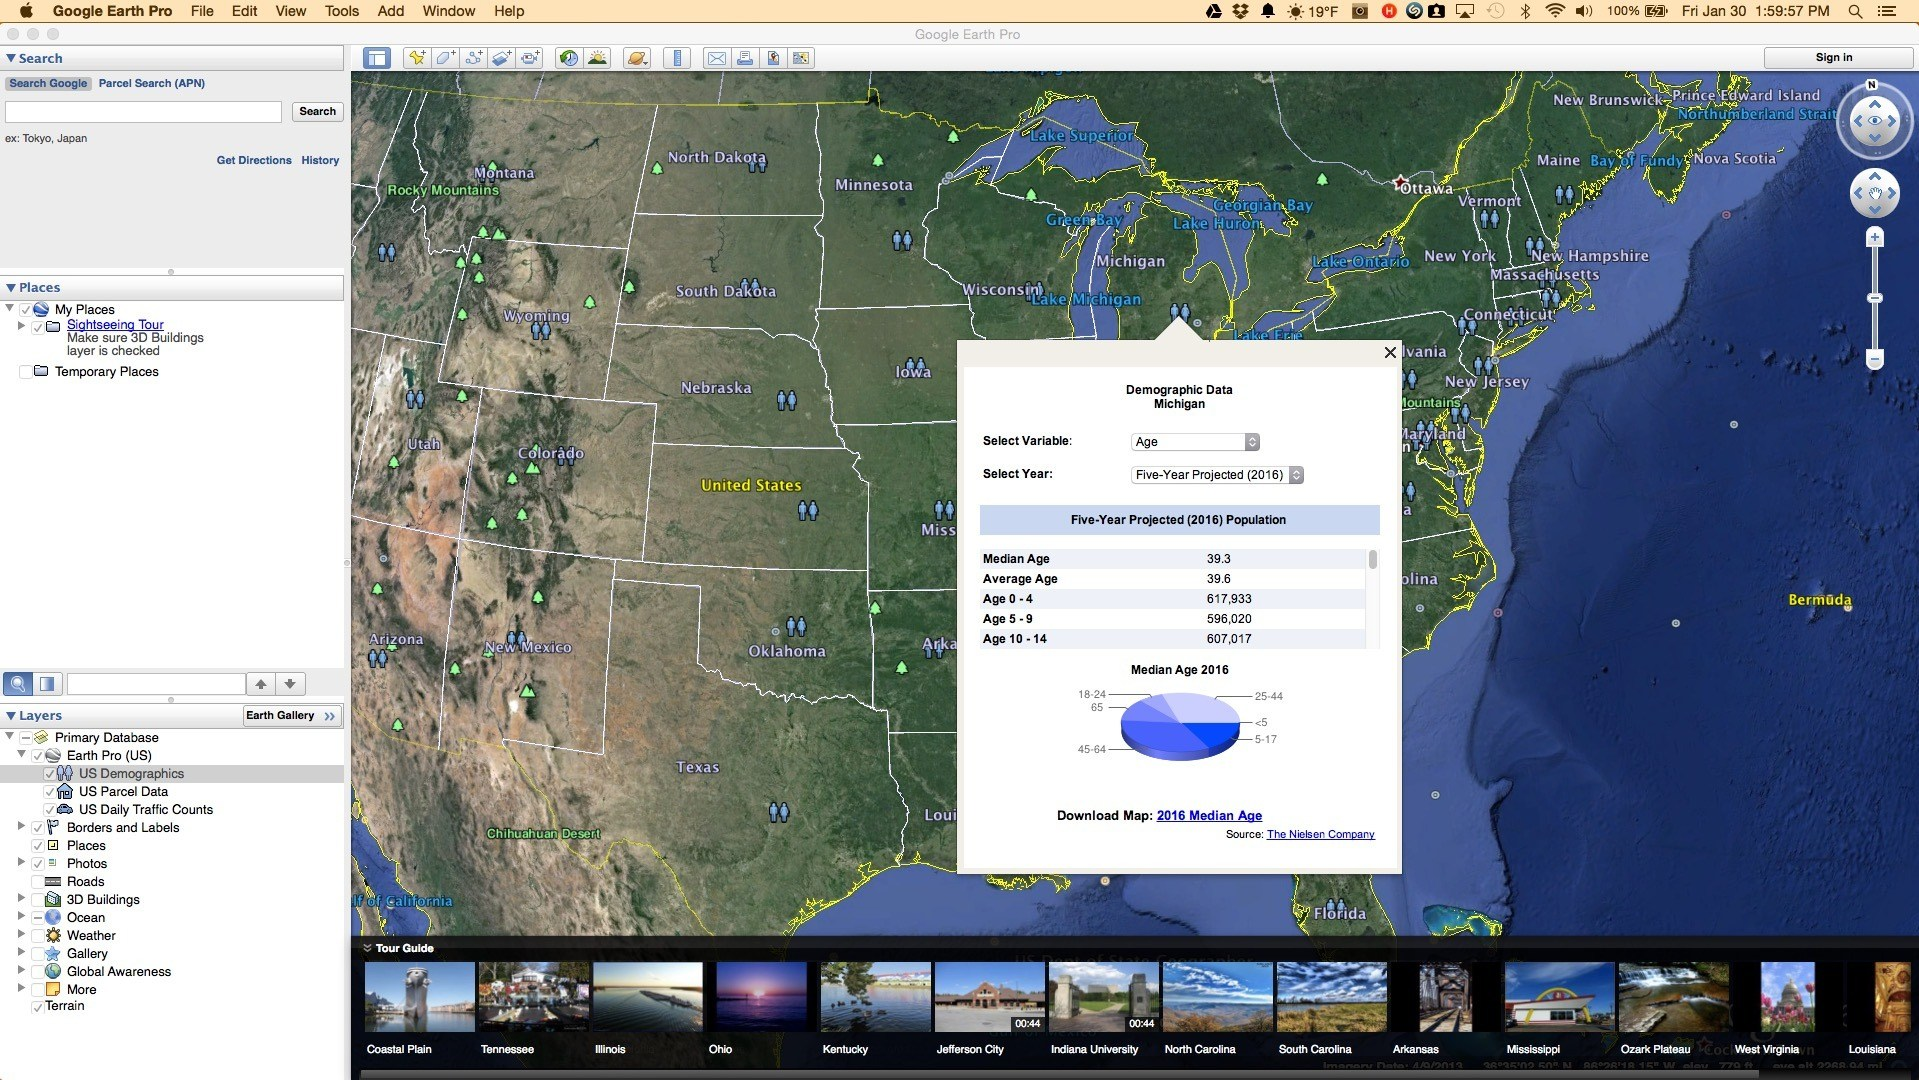 Great Google Earth Pro